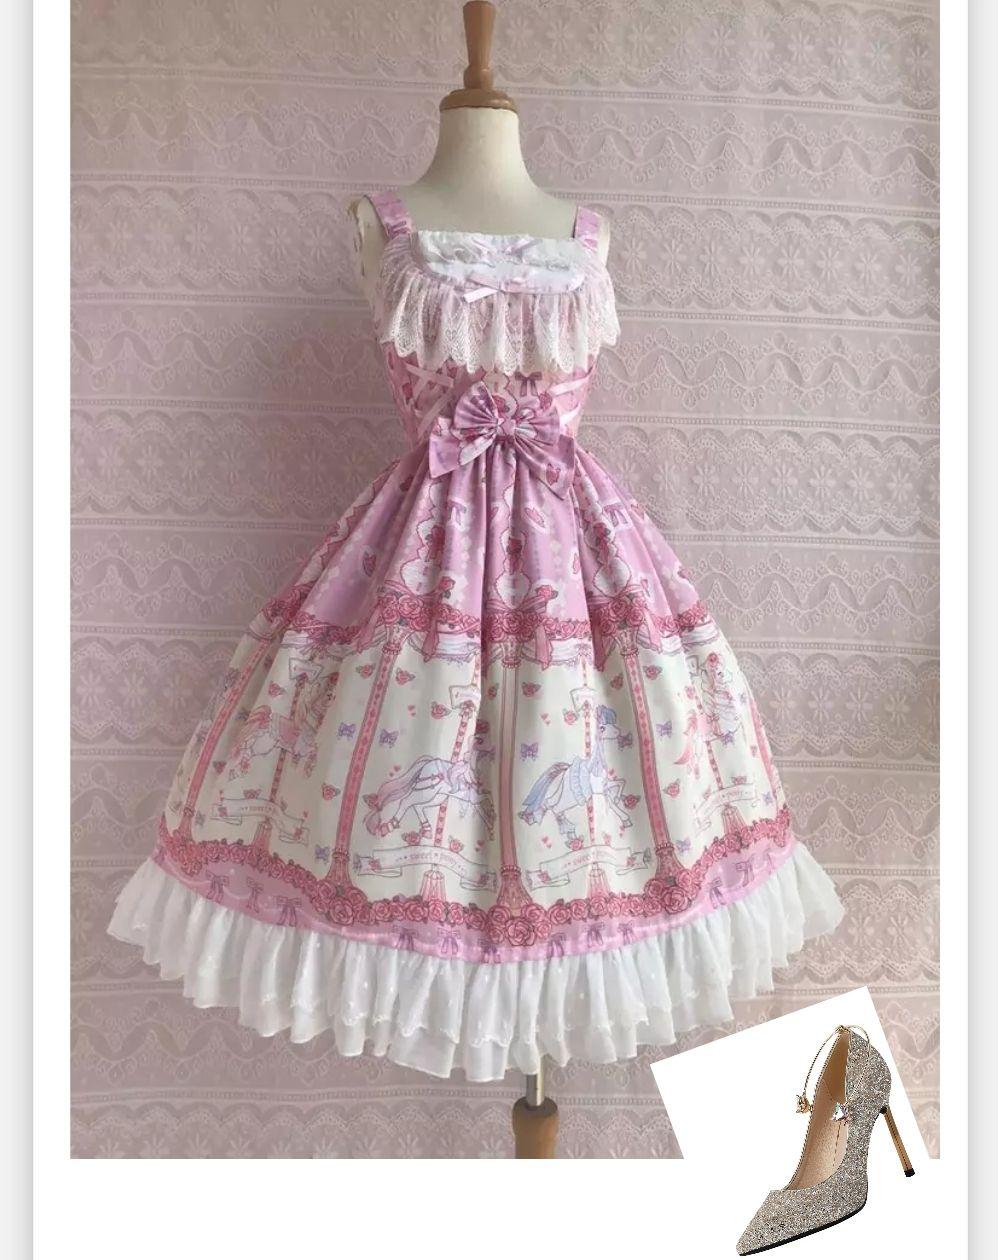 ( Dress+Shoes ) One Piece Style Pink Quality Theme Costume Fashionable  Apparel Designer Women\'s Dress Sweet Lolita Dress Plus Size